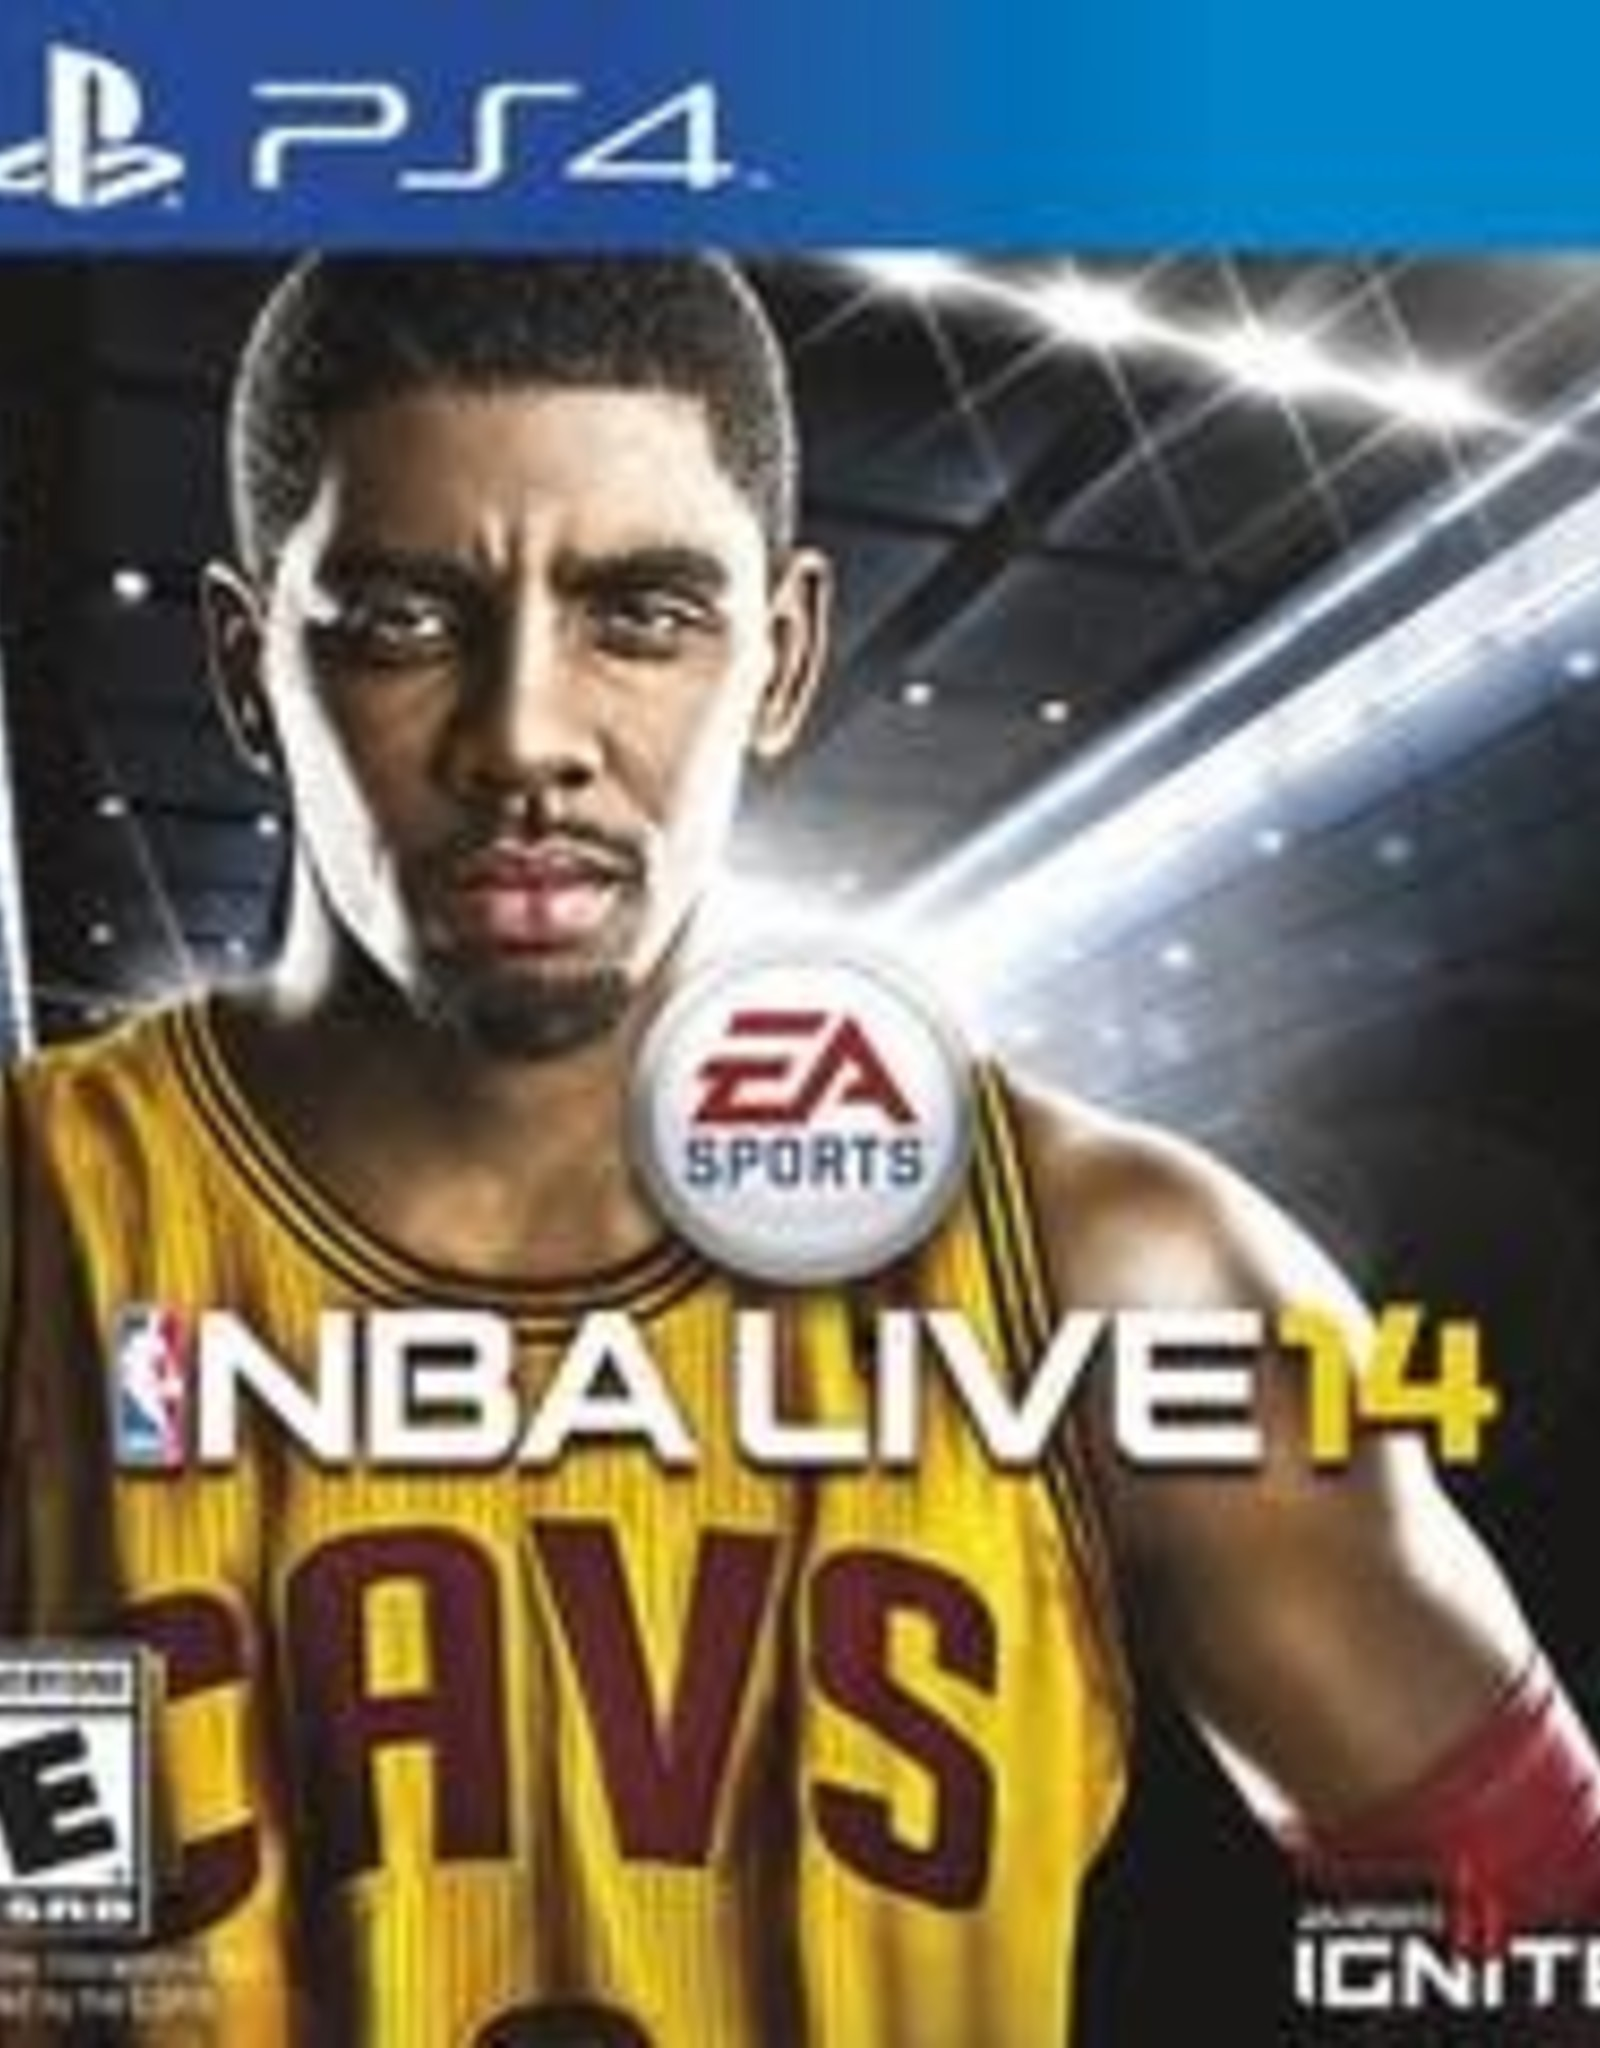 Playstation 4 NBA Live 14